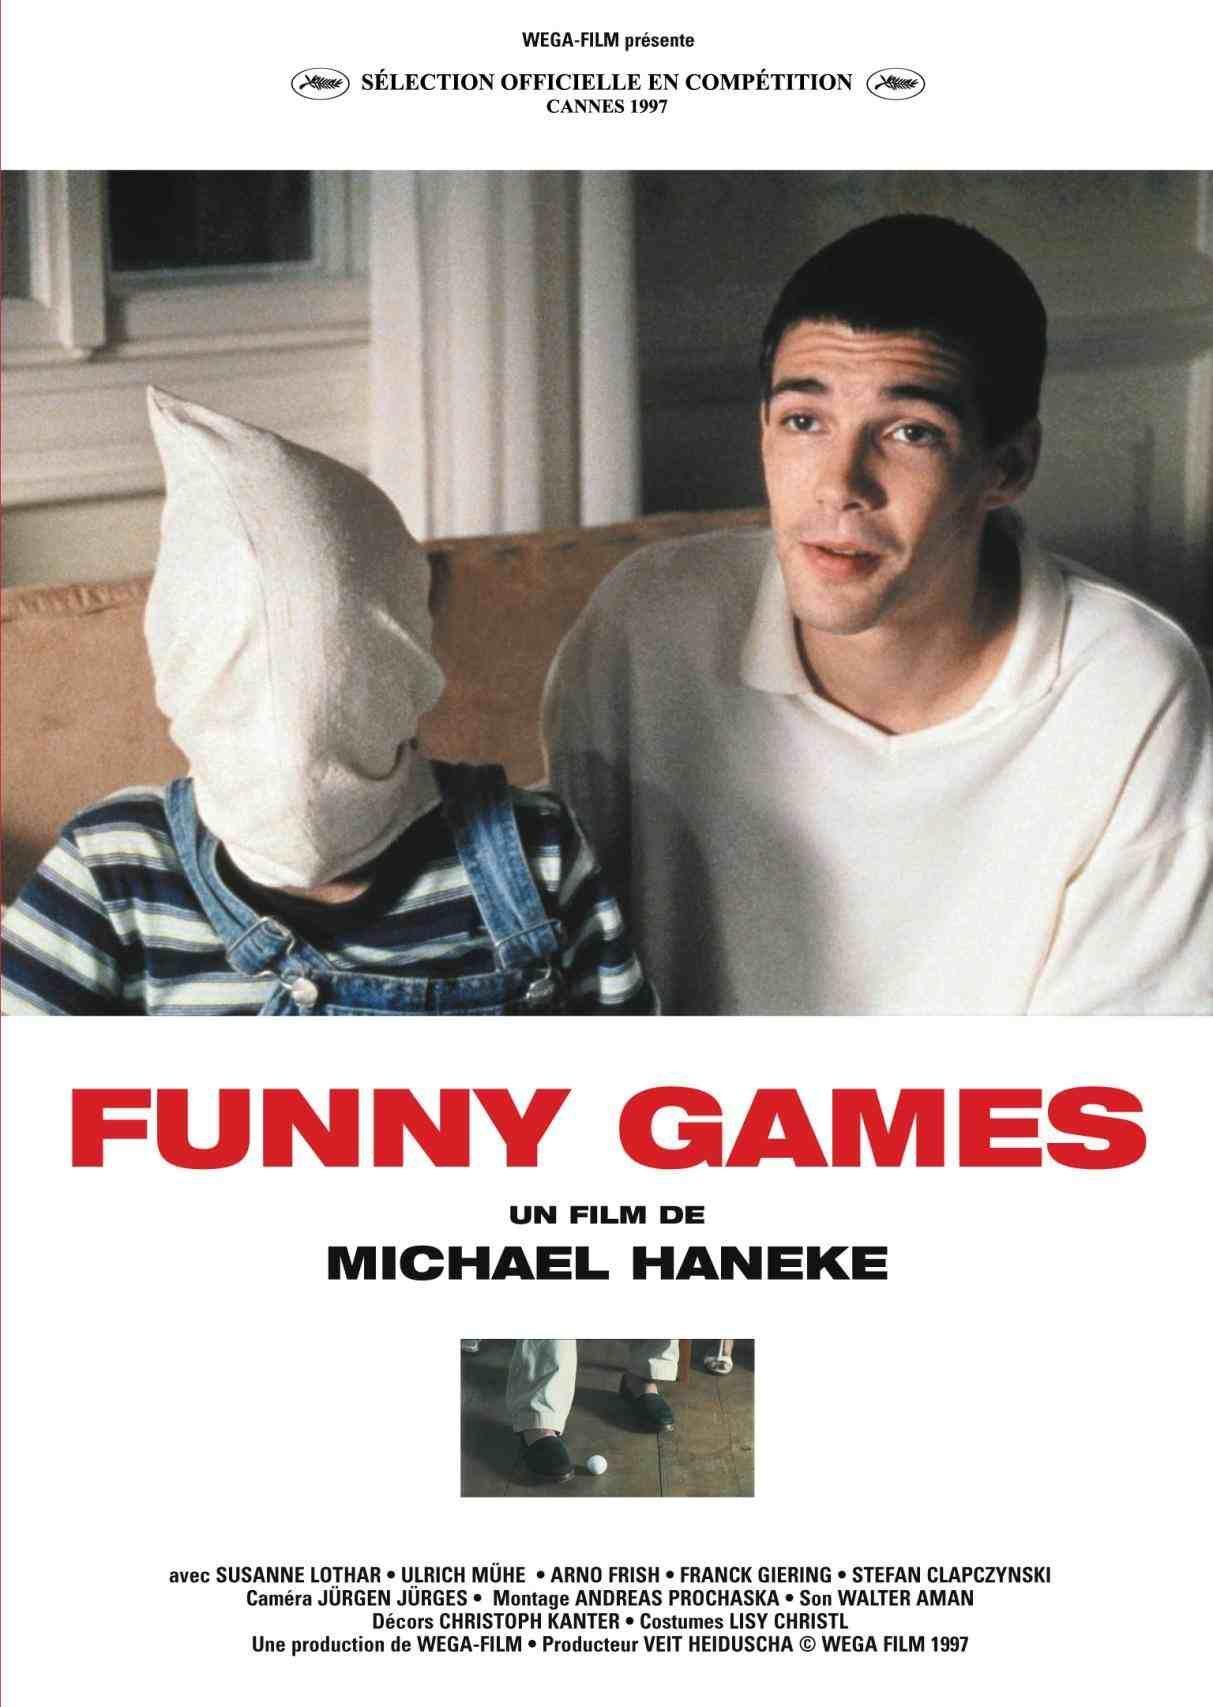 Funny Picture Games : funny, picture, games, FUNNY, GAMES, Funny, Games,, Movie, Game,